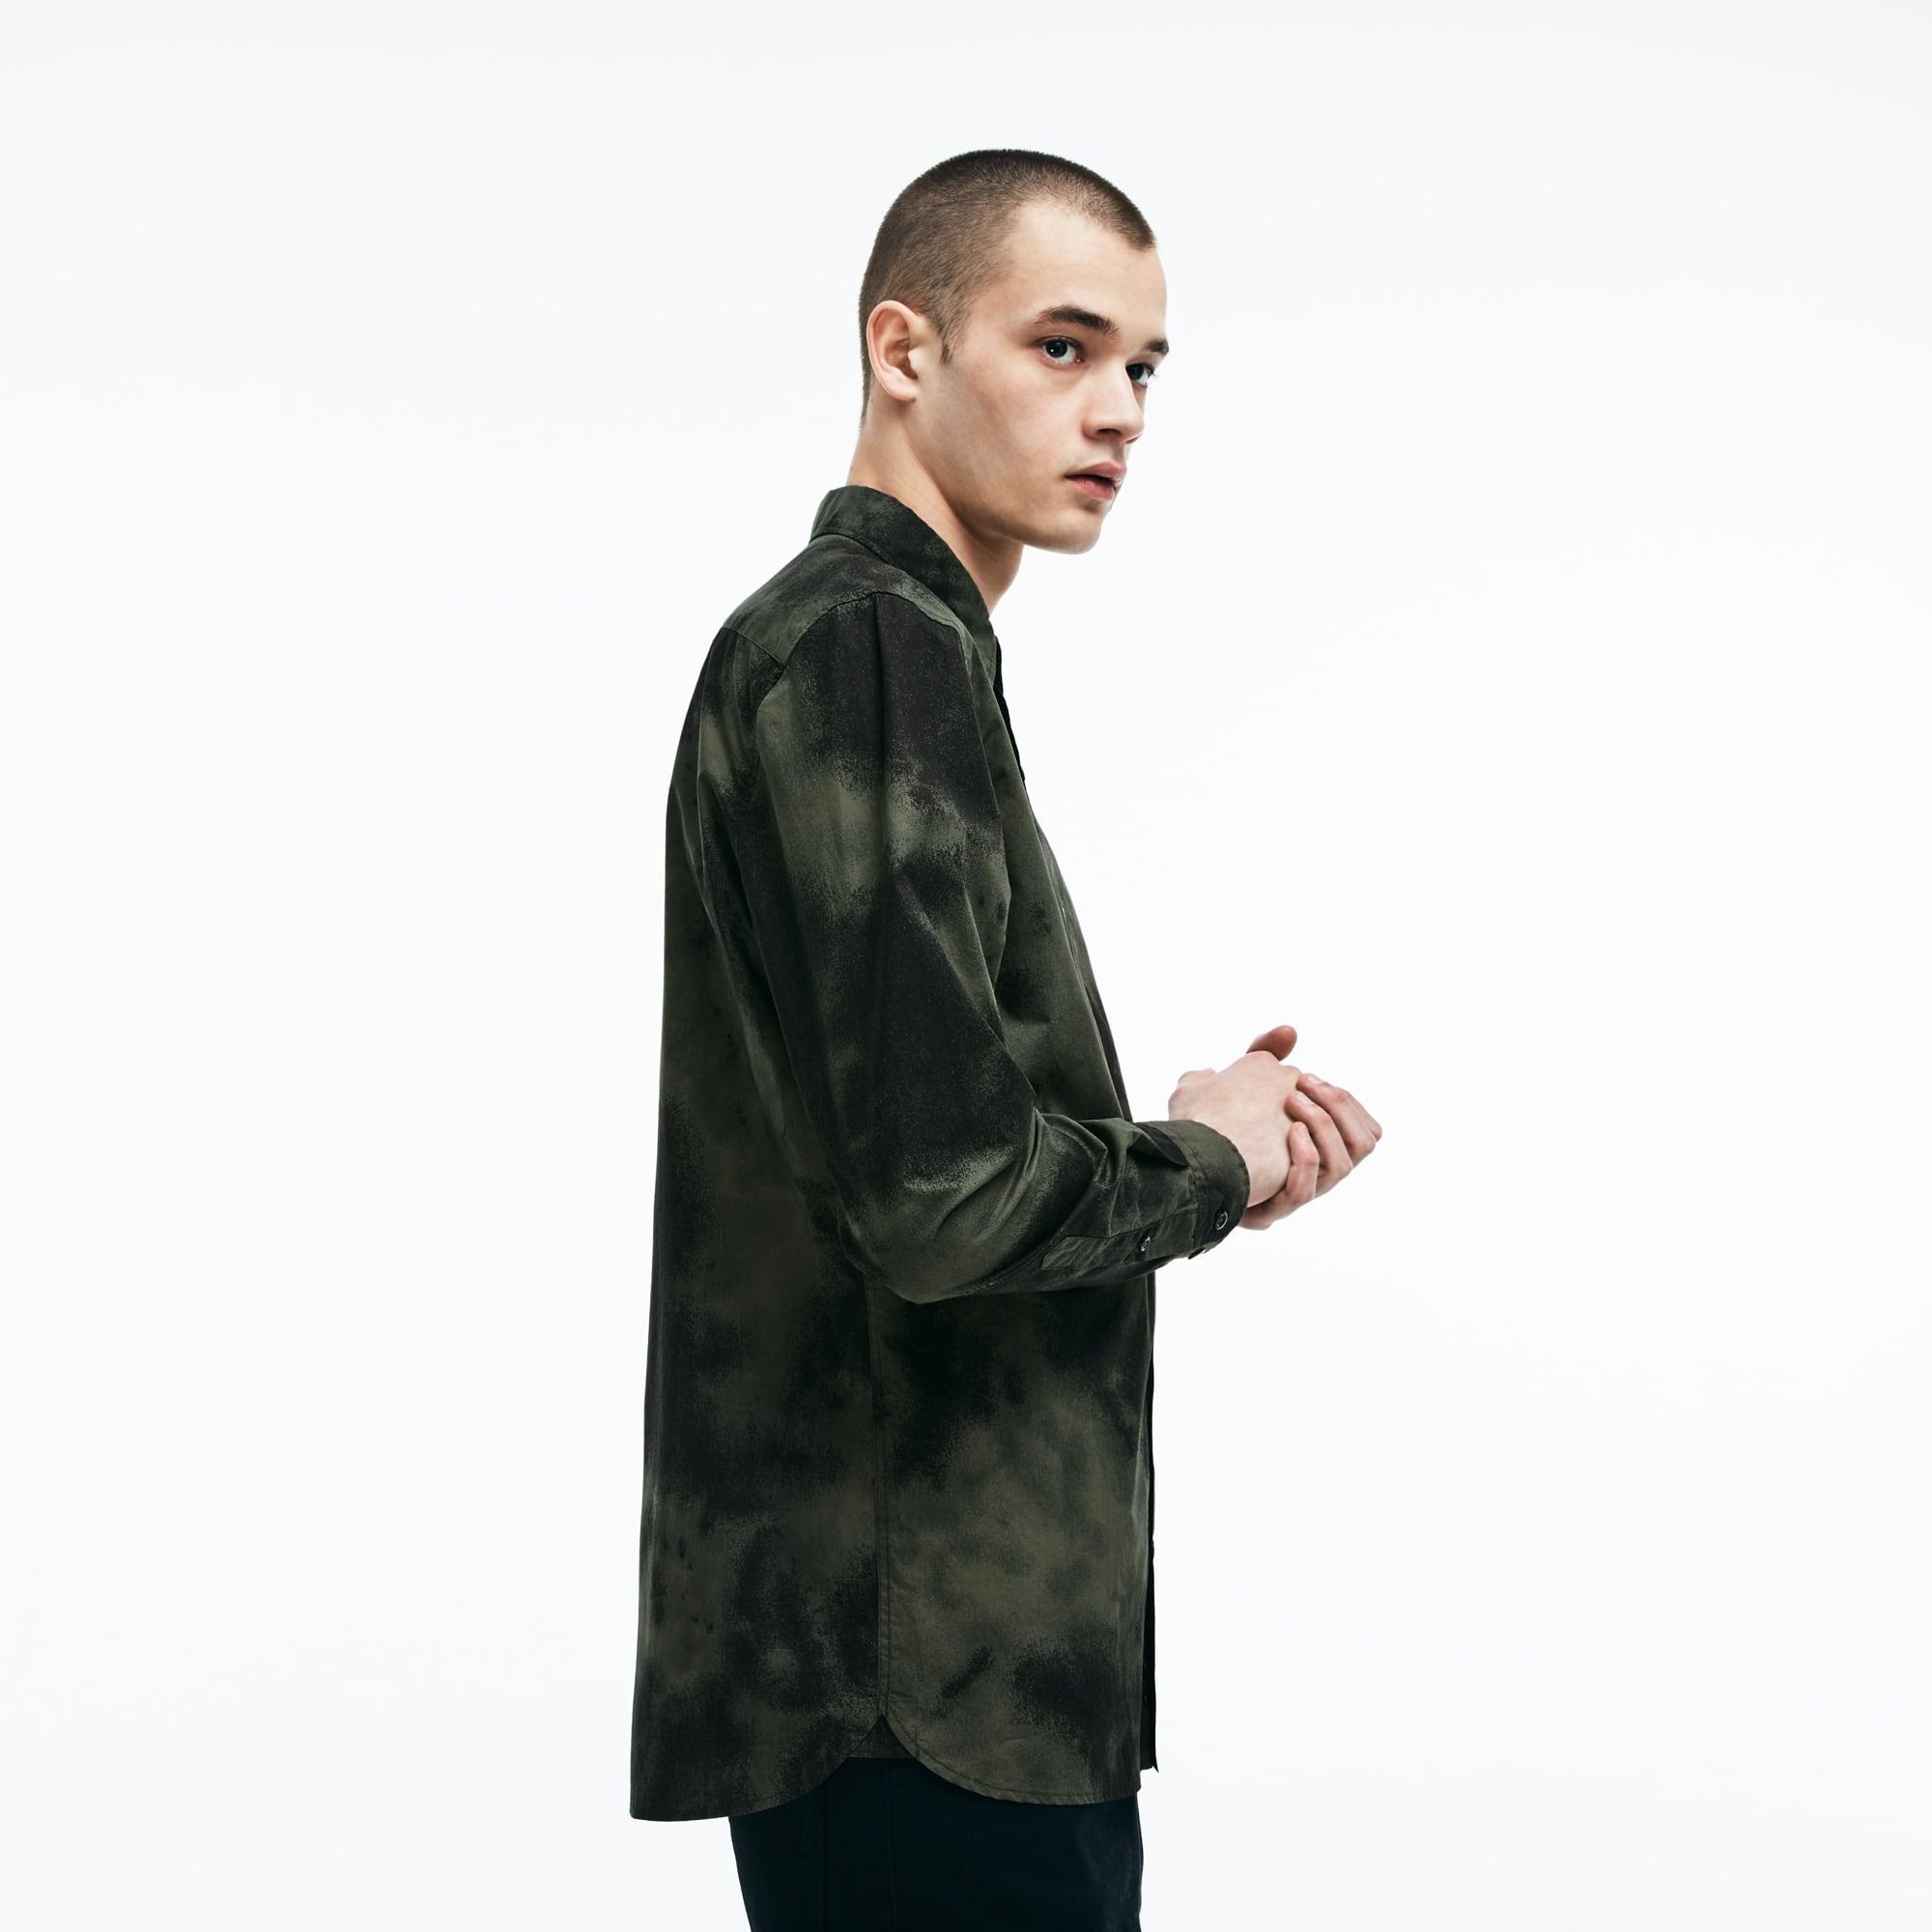 Camisas para hombre   Moda para hombre   LACOSTE ffb017b80d